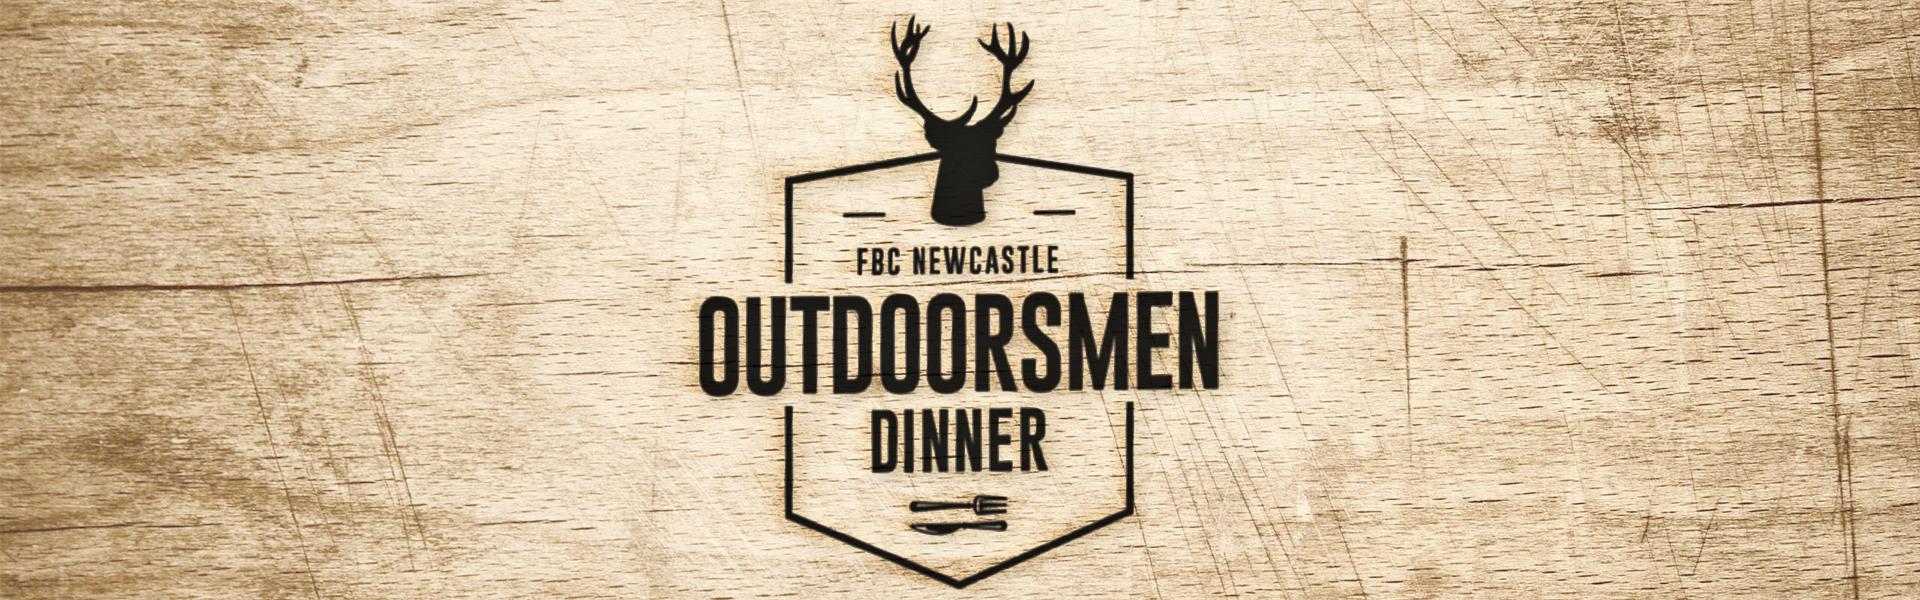 Outdoorsmen dinner web